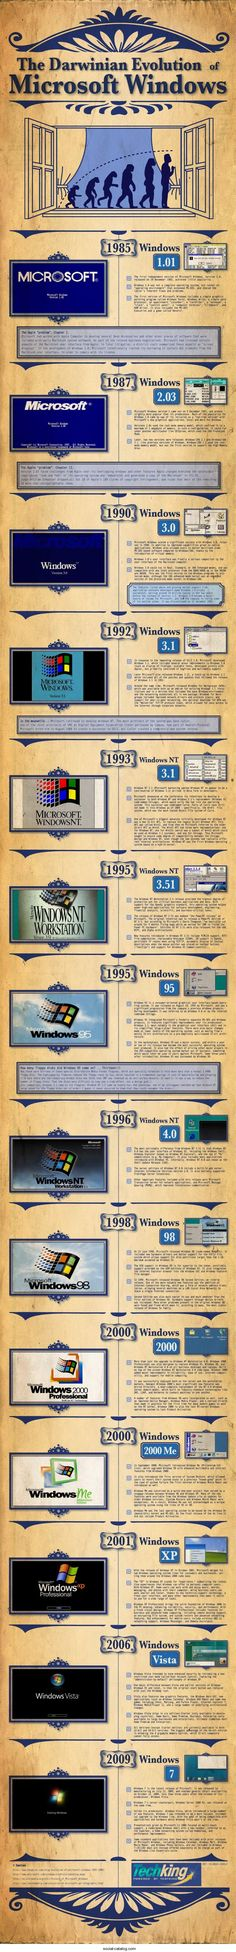 history of micrsoft windows via @visually